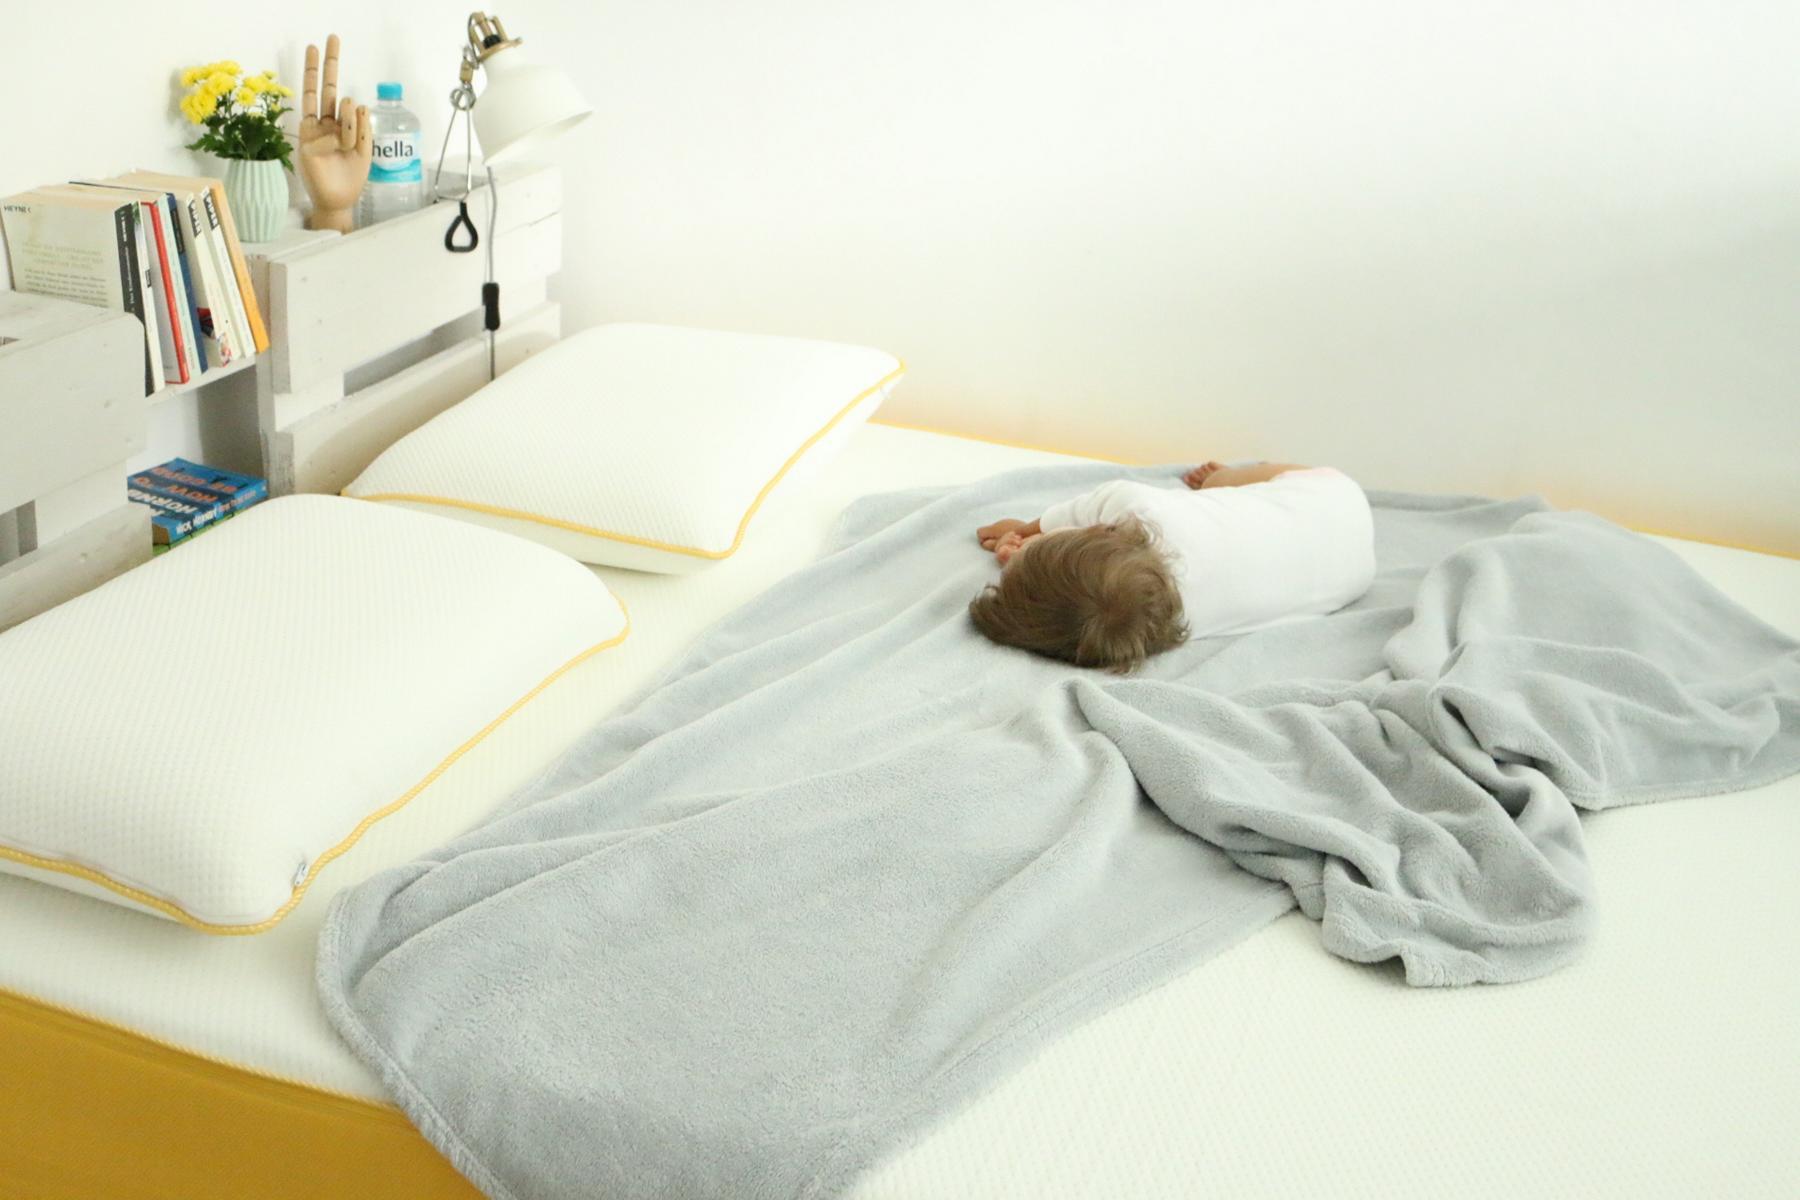 Eve Matratzen Test - Bett aus Europaletten